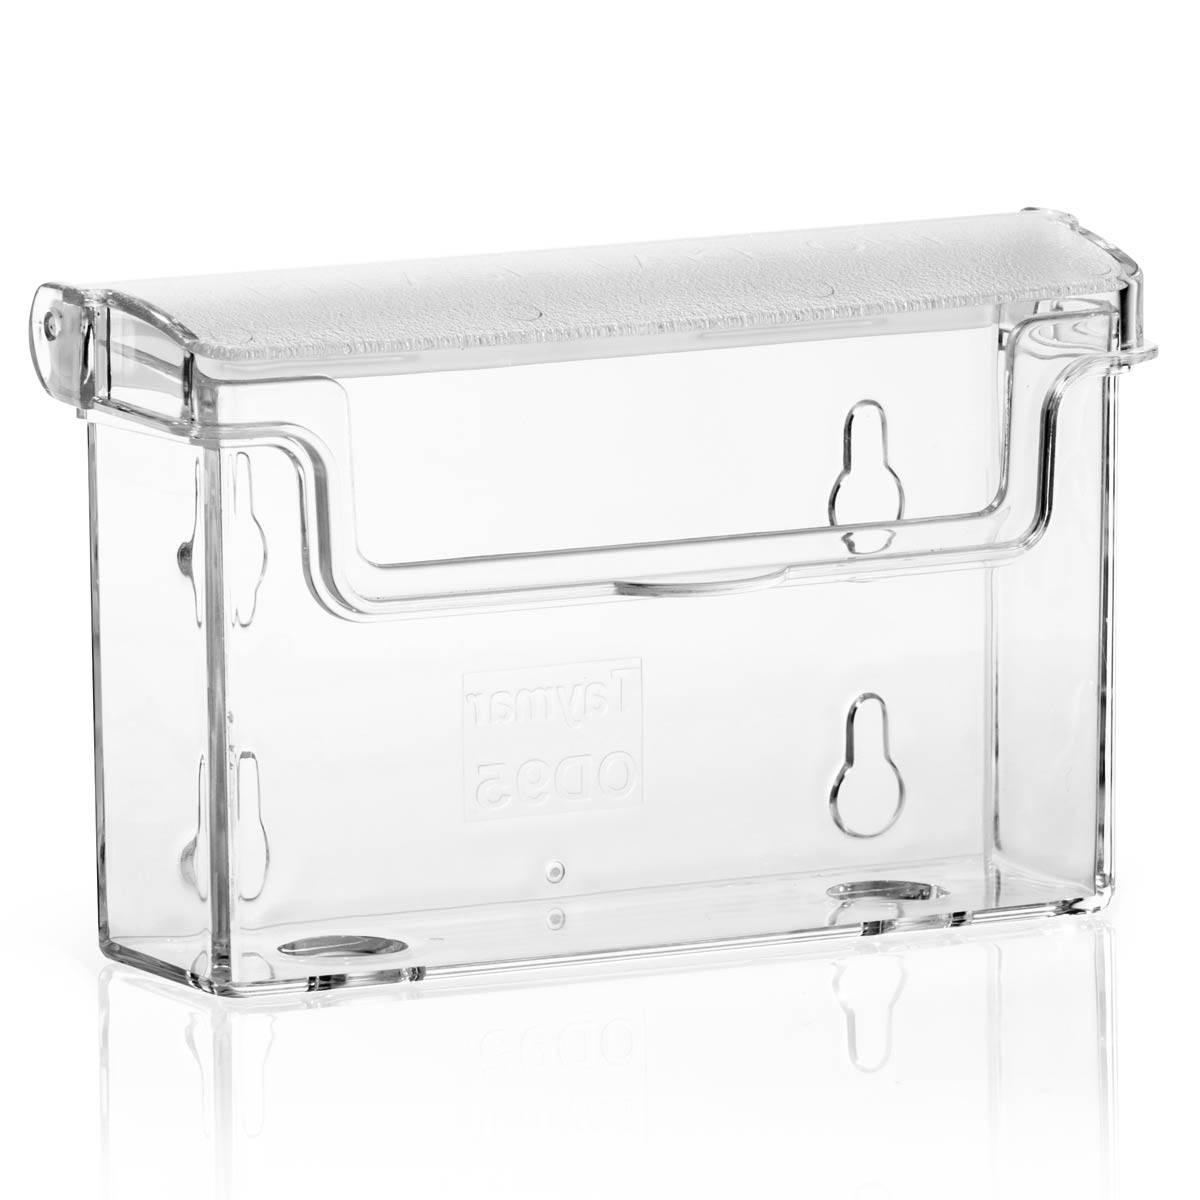 Wetterfester Din A4 Prospekthalter Prospektbox Aus